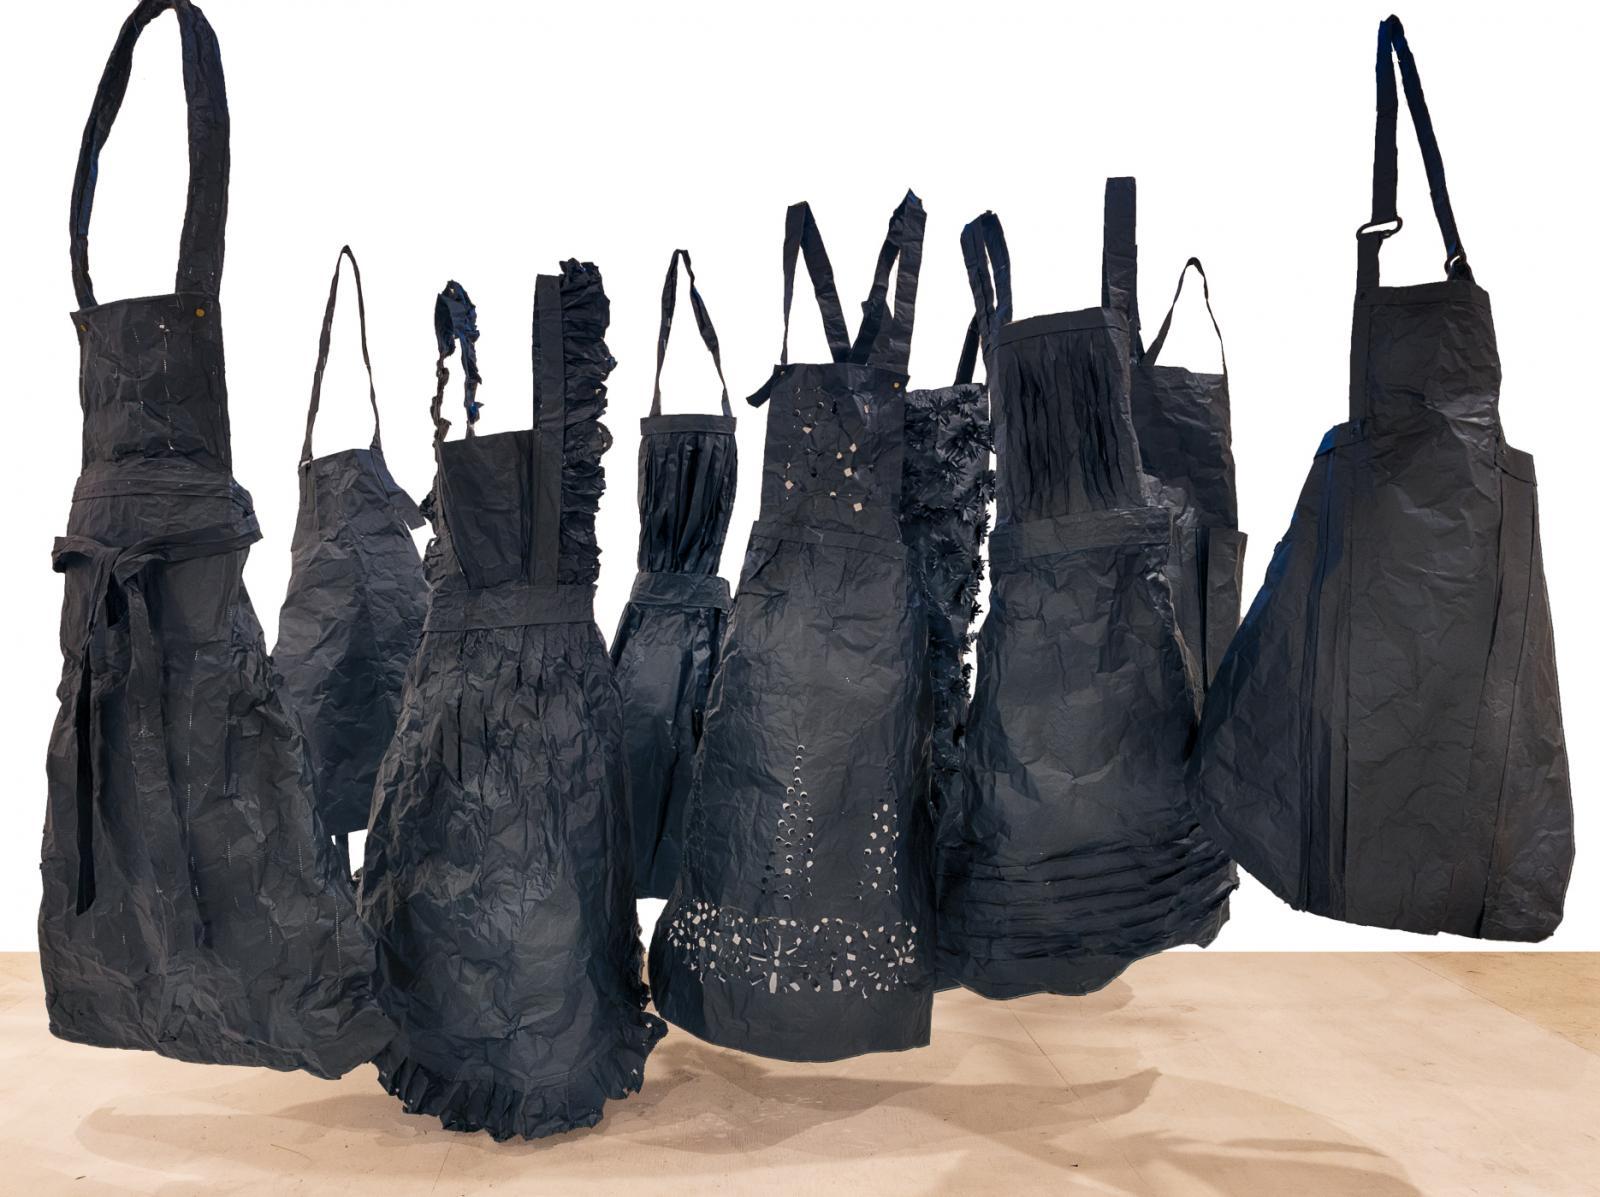 Aprons (Studio Installation) 2020- Cinefoil, black carabiners, gaffers tape, paper fasteners 9'Hx16'Wx12'D